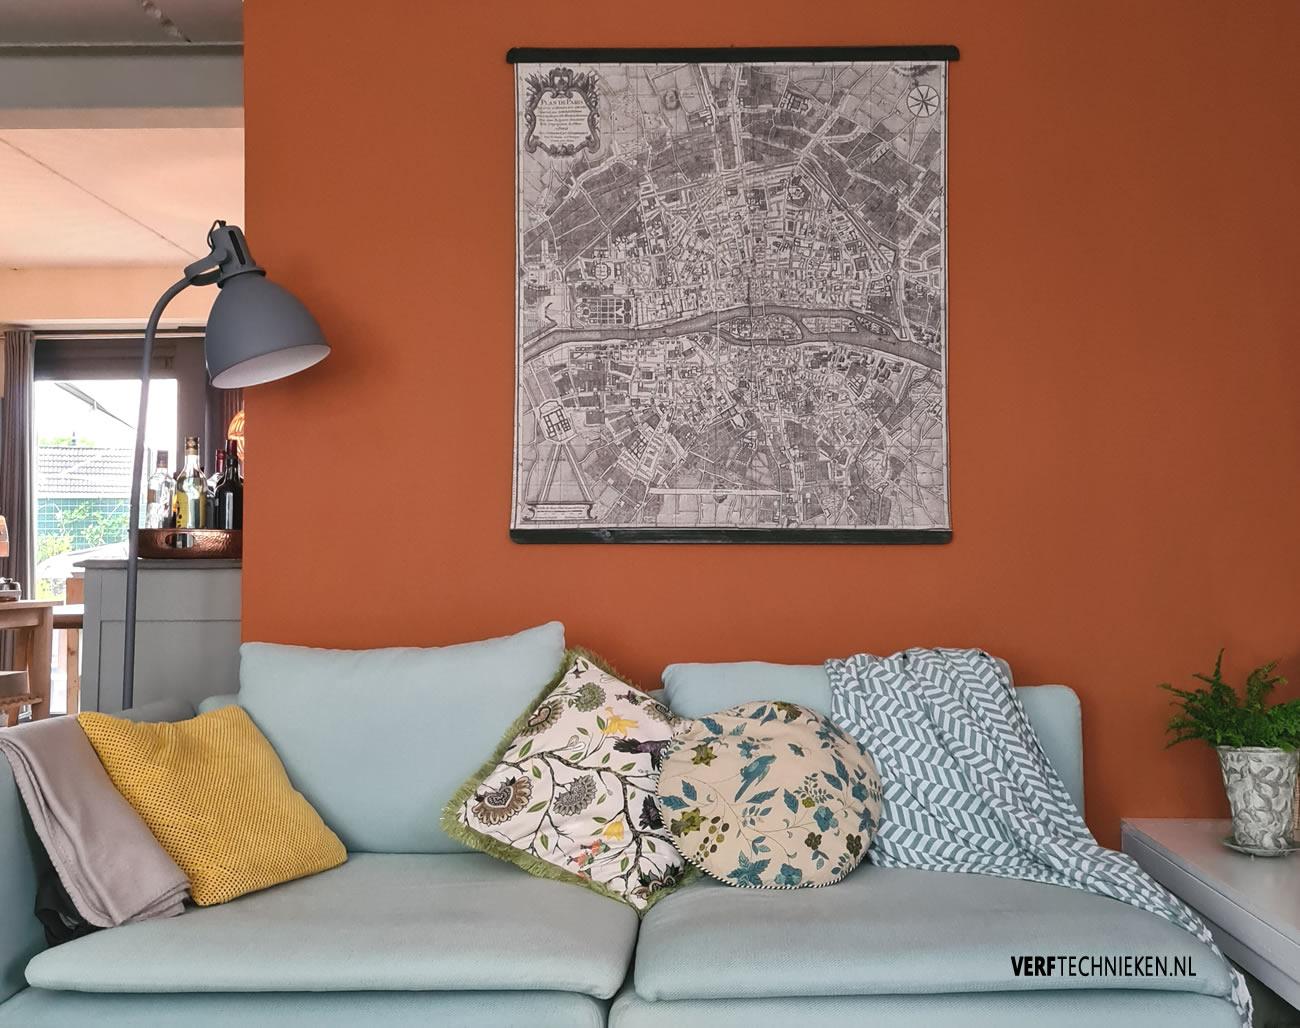 Abbondanza Terracotta krijtverf op de muur